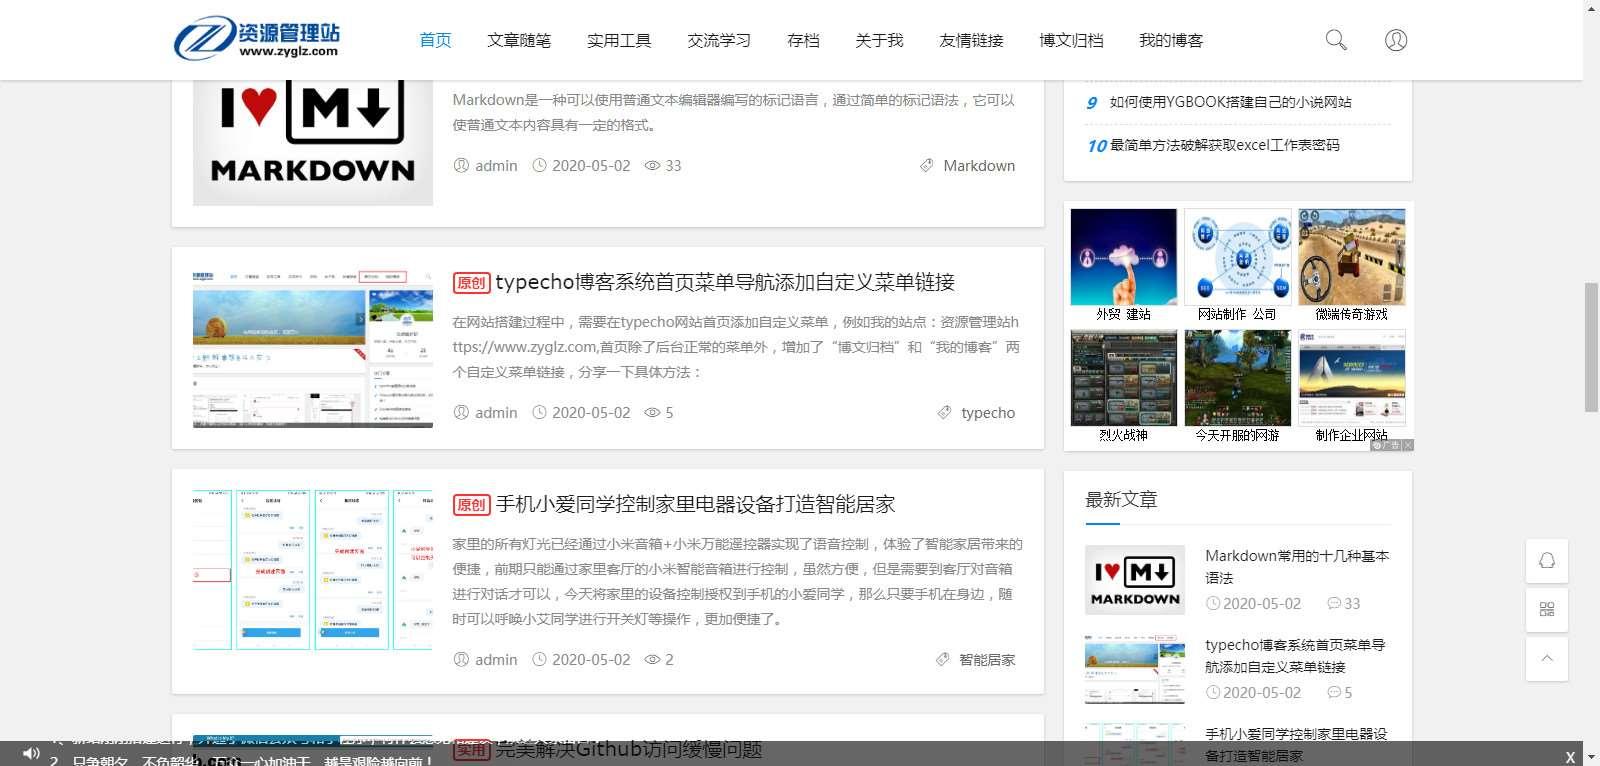 Typecho博客个人网站申请添加和投放百度联盟广告<span style='color:red'>[置顶]</span>